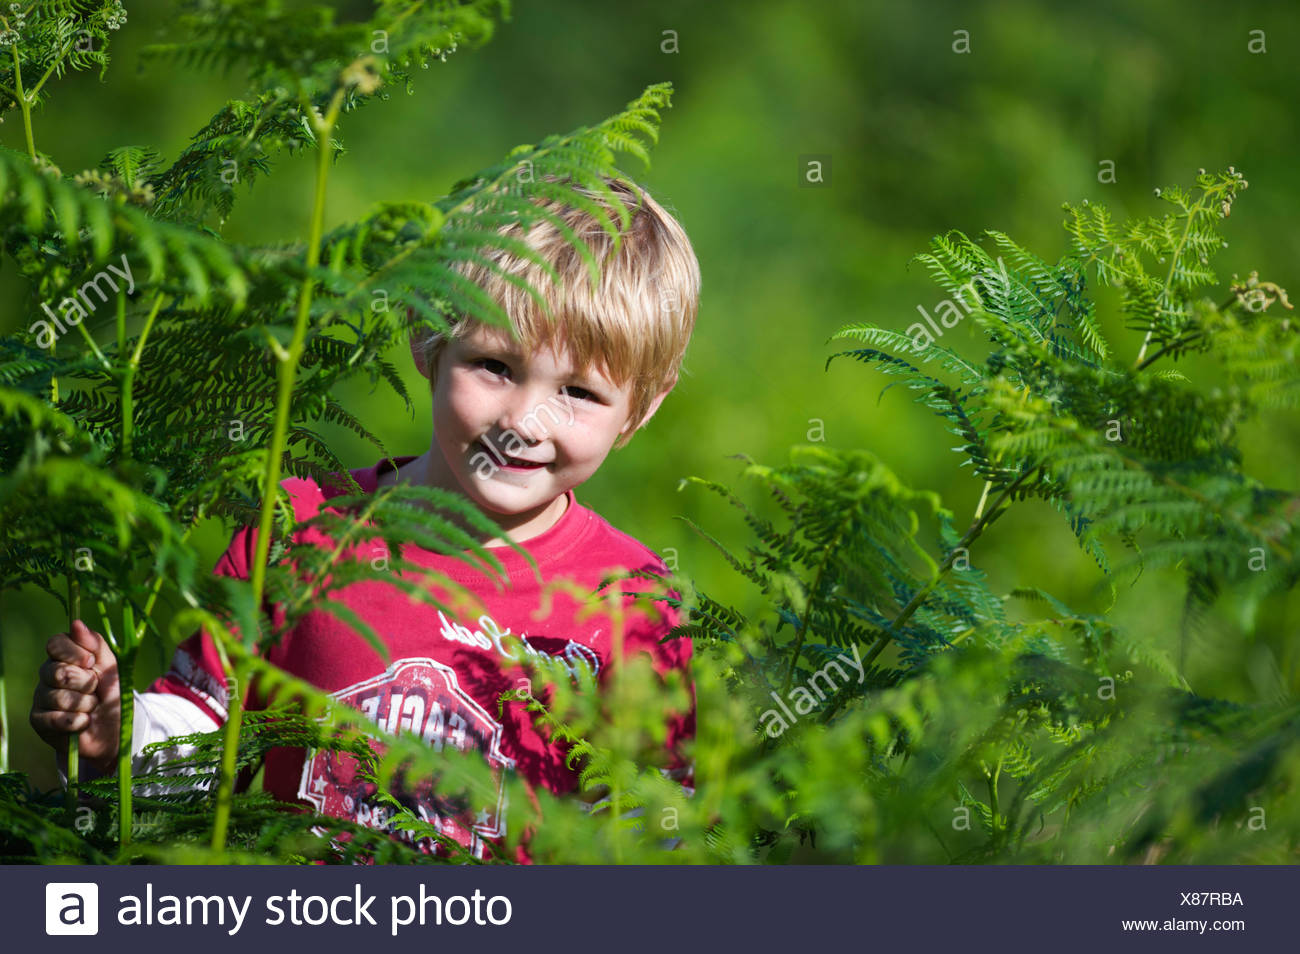 Young boy playing among bracken Norfolk summer - Stock Image